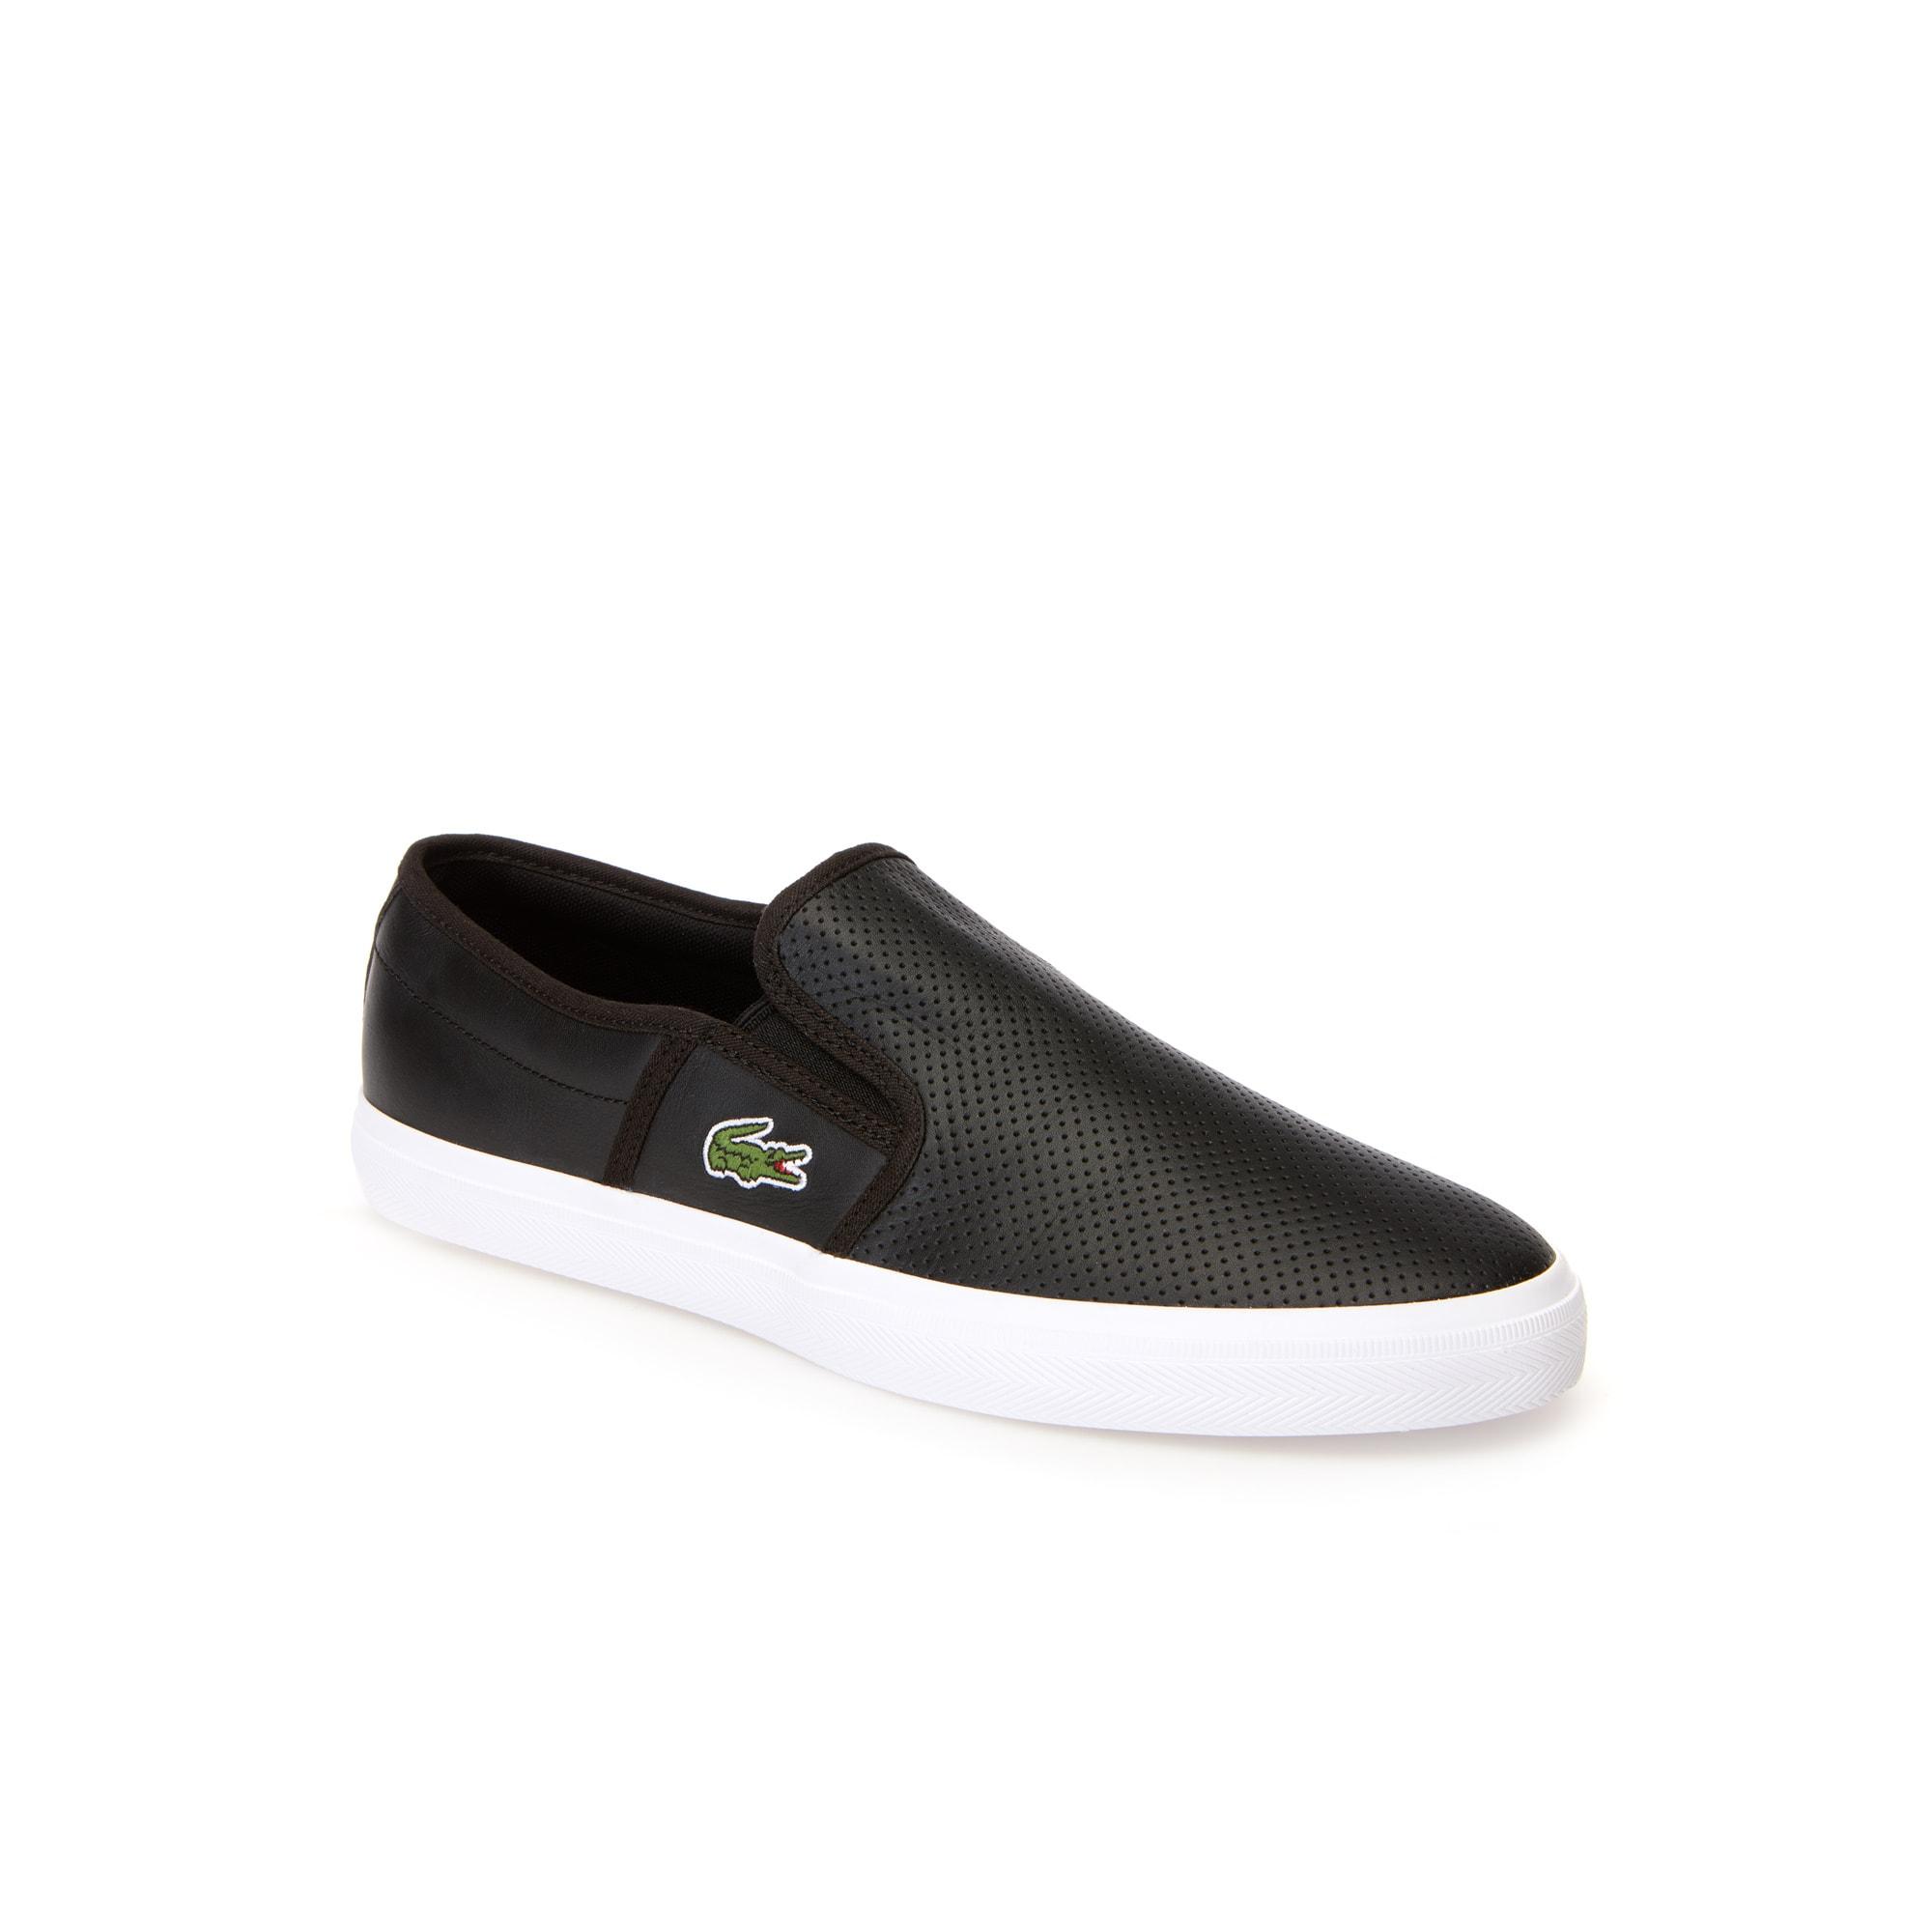 Men's Gazon Nappa Leather Slip-Ons